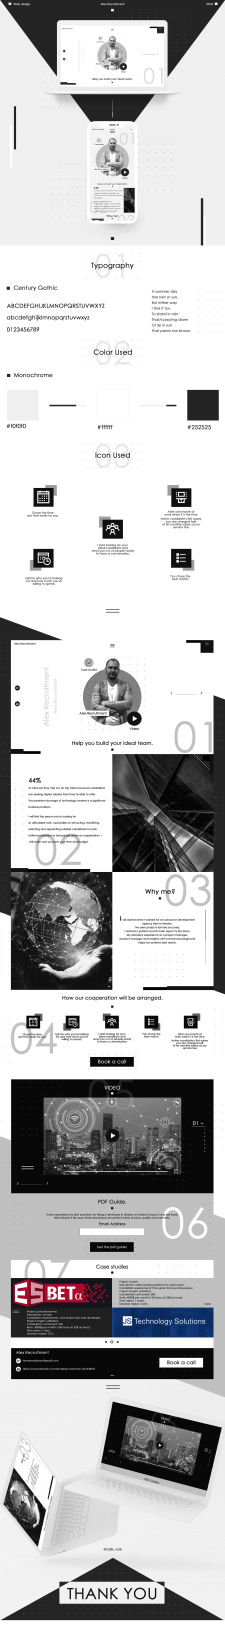 Web design - Alex Recruitment